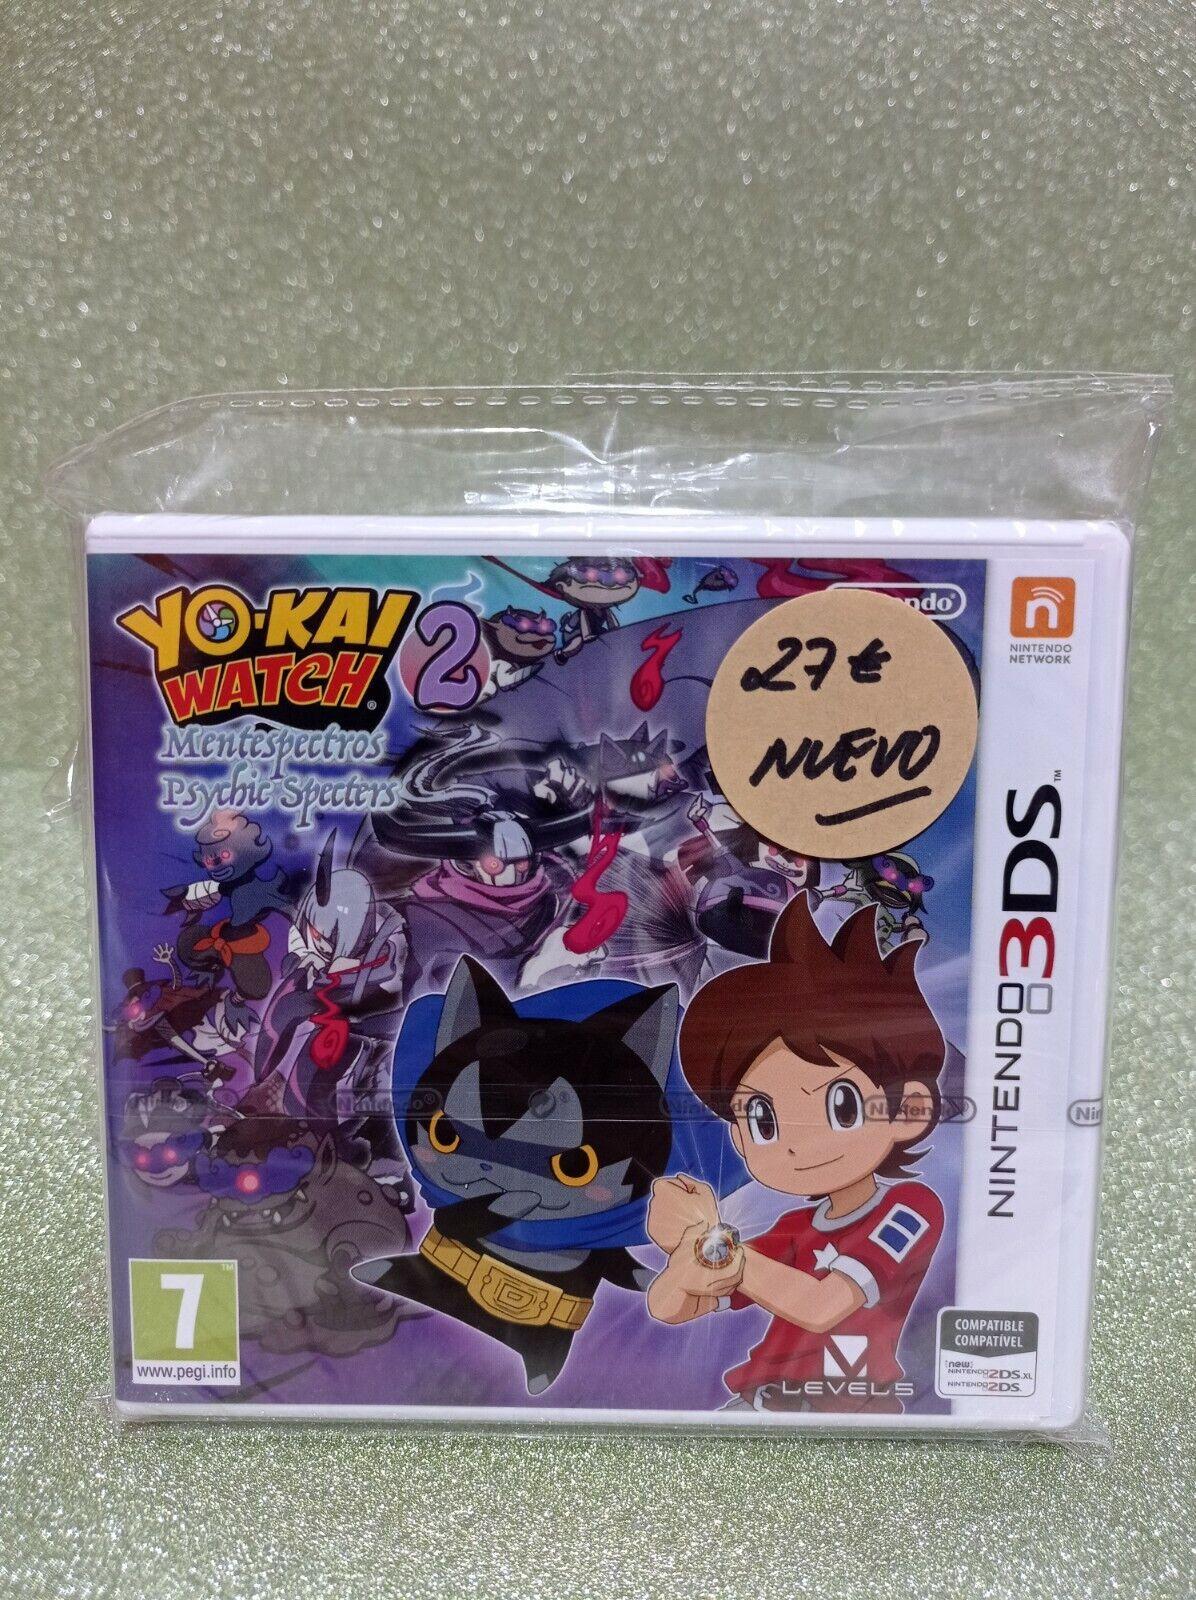 JUEGO NINTENDO 3DS - YO-KAI 2 WATCH MENTESPECTROS PSYCHIC SPECTERS